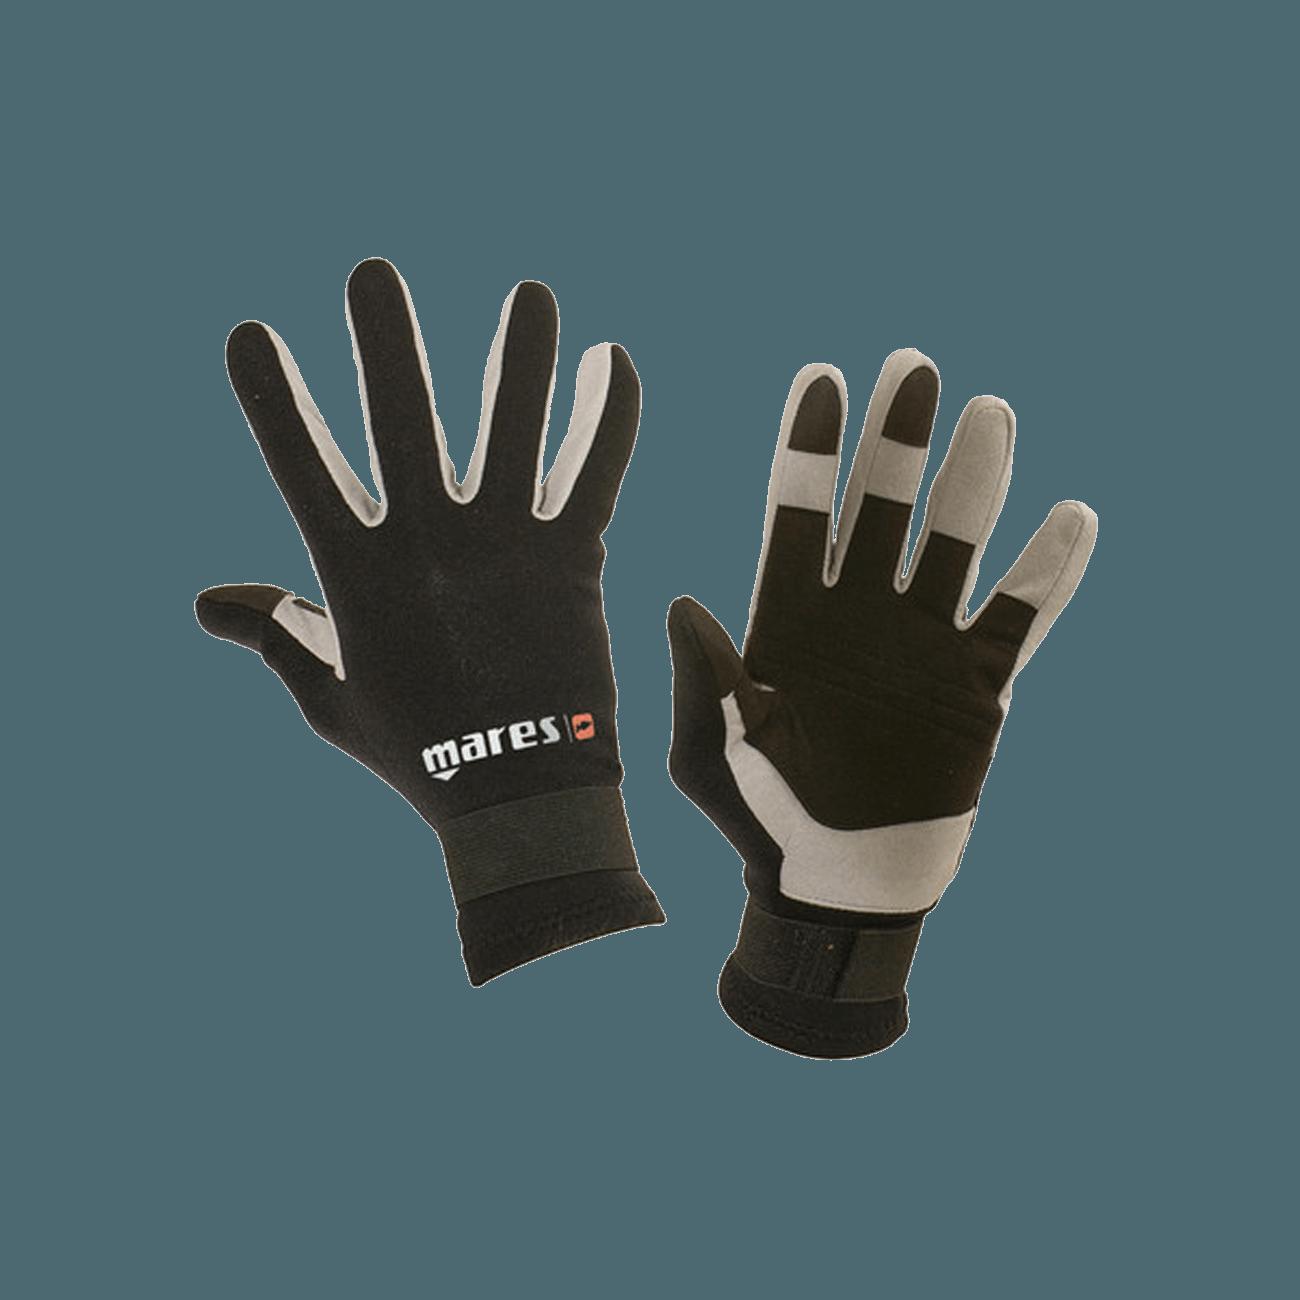 Mares Amara 20 Gloves | Mares Dive Gloves | Gill Divers